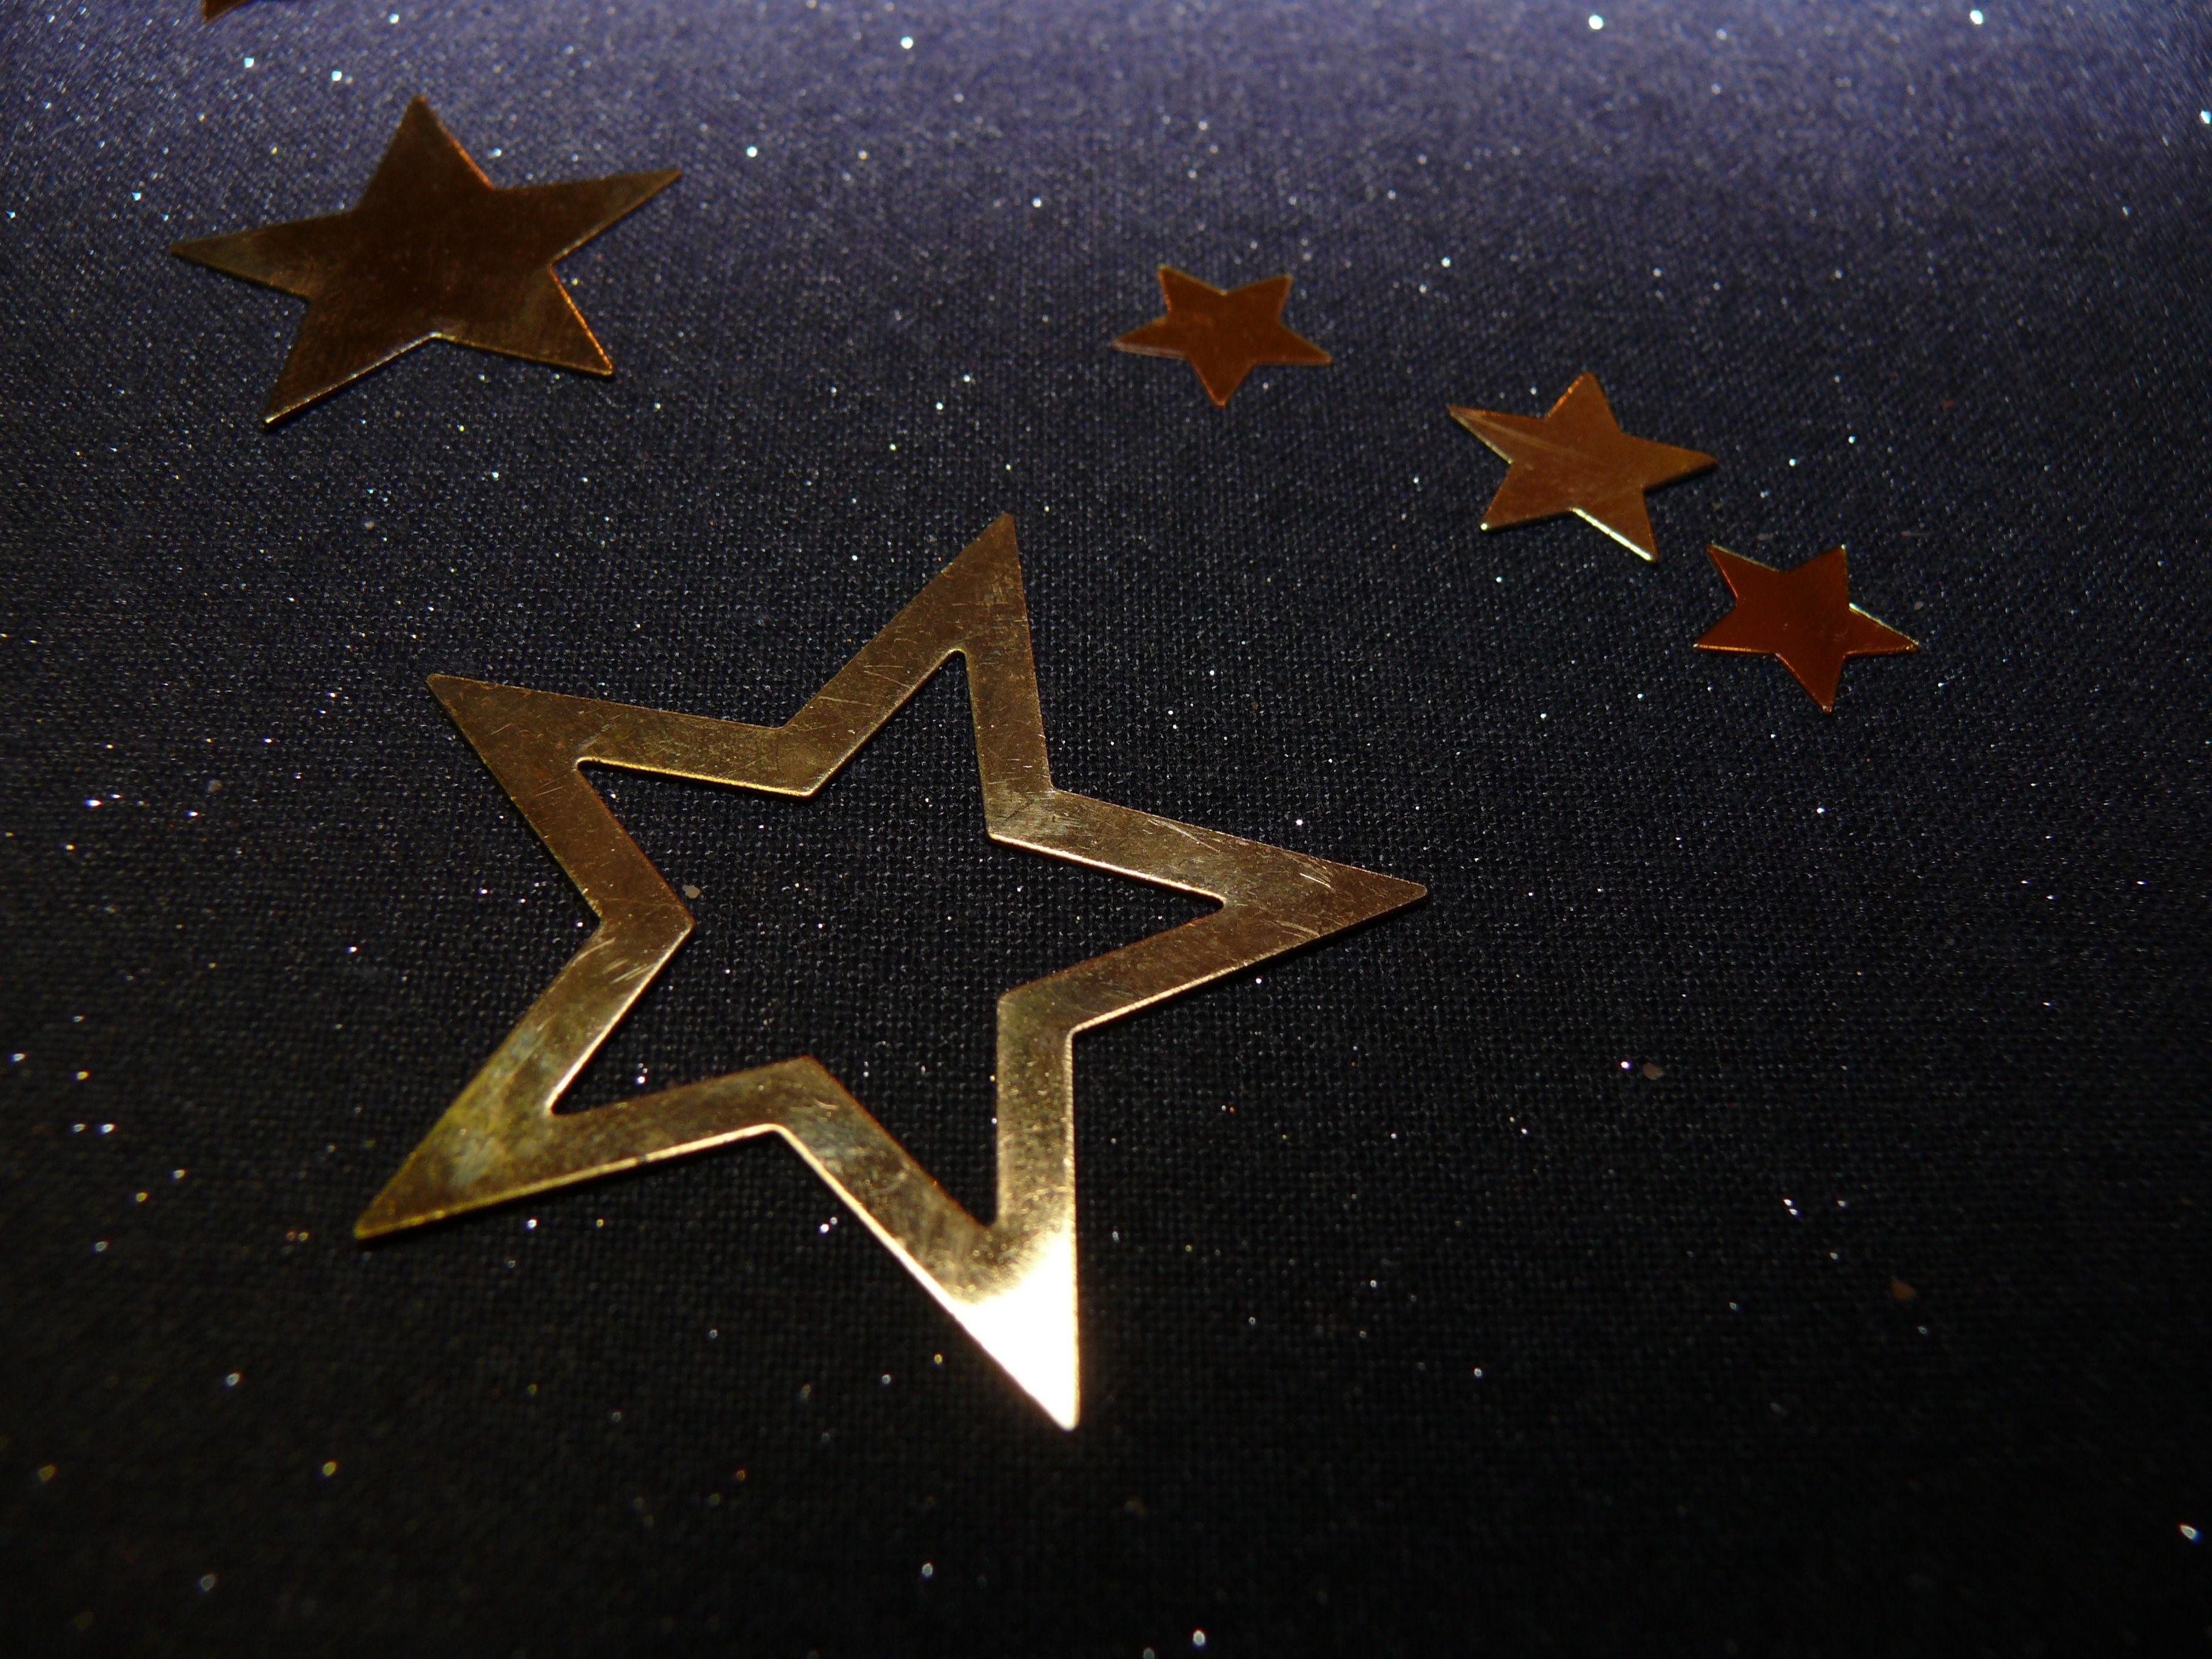 Free Images Star Decoration Space Sparkle Deco Advent